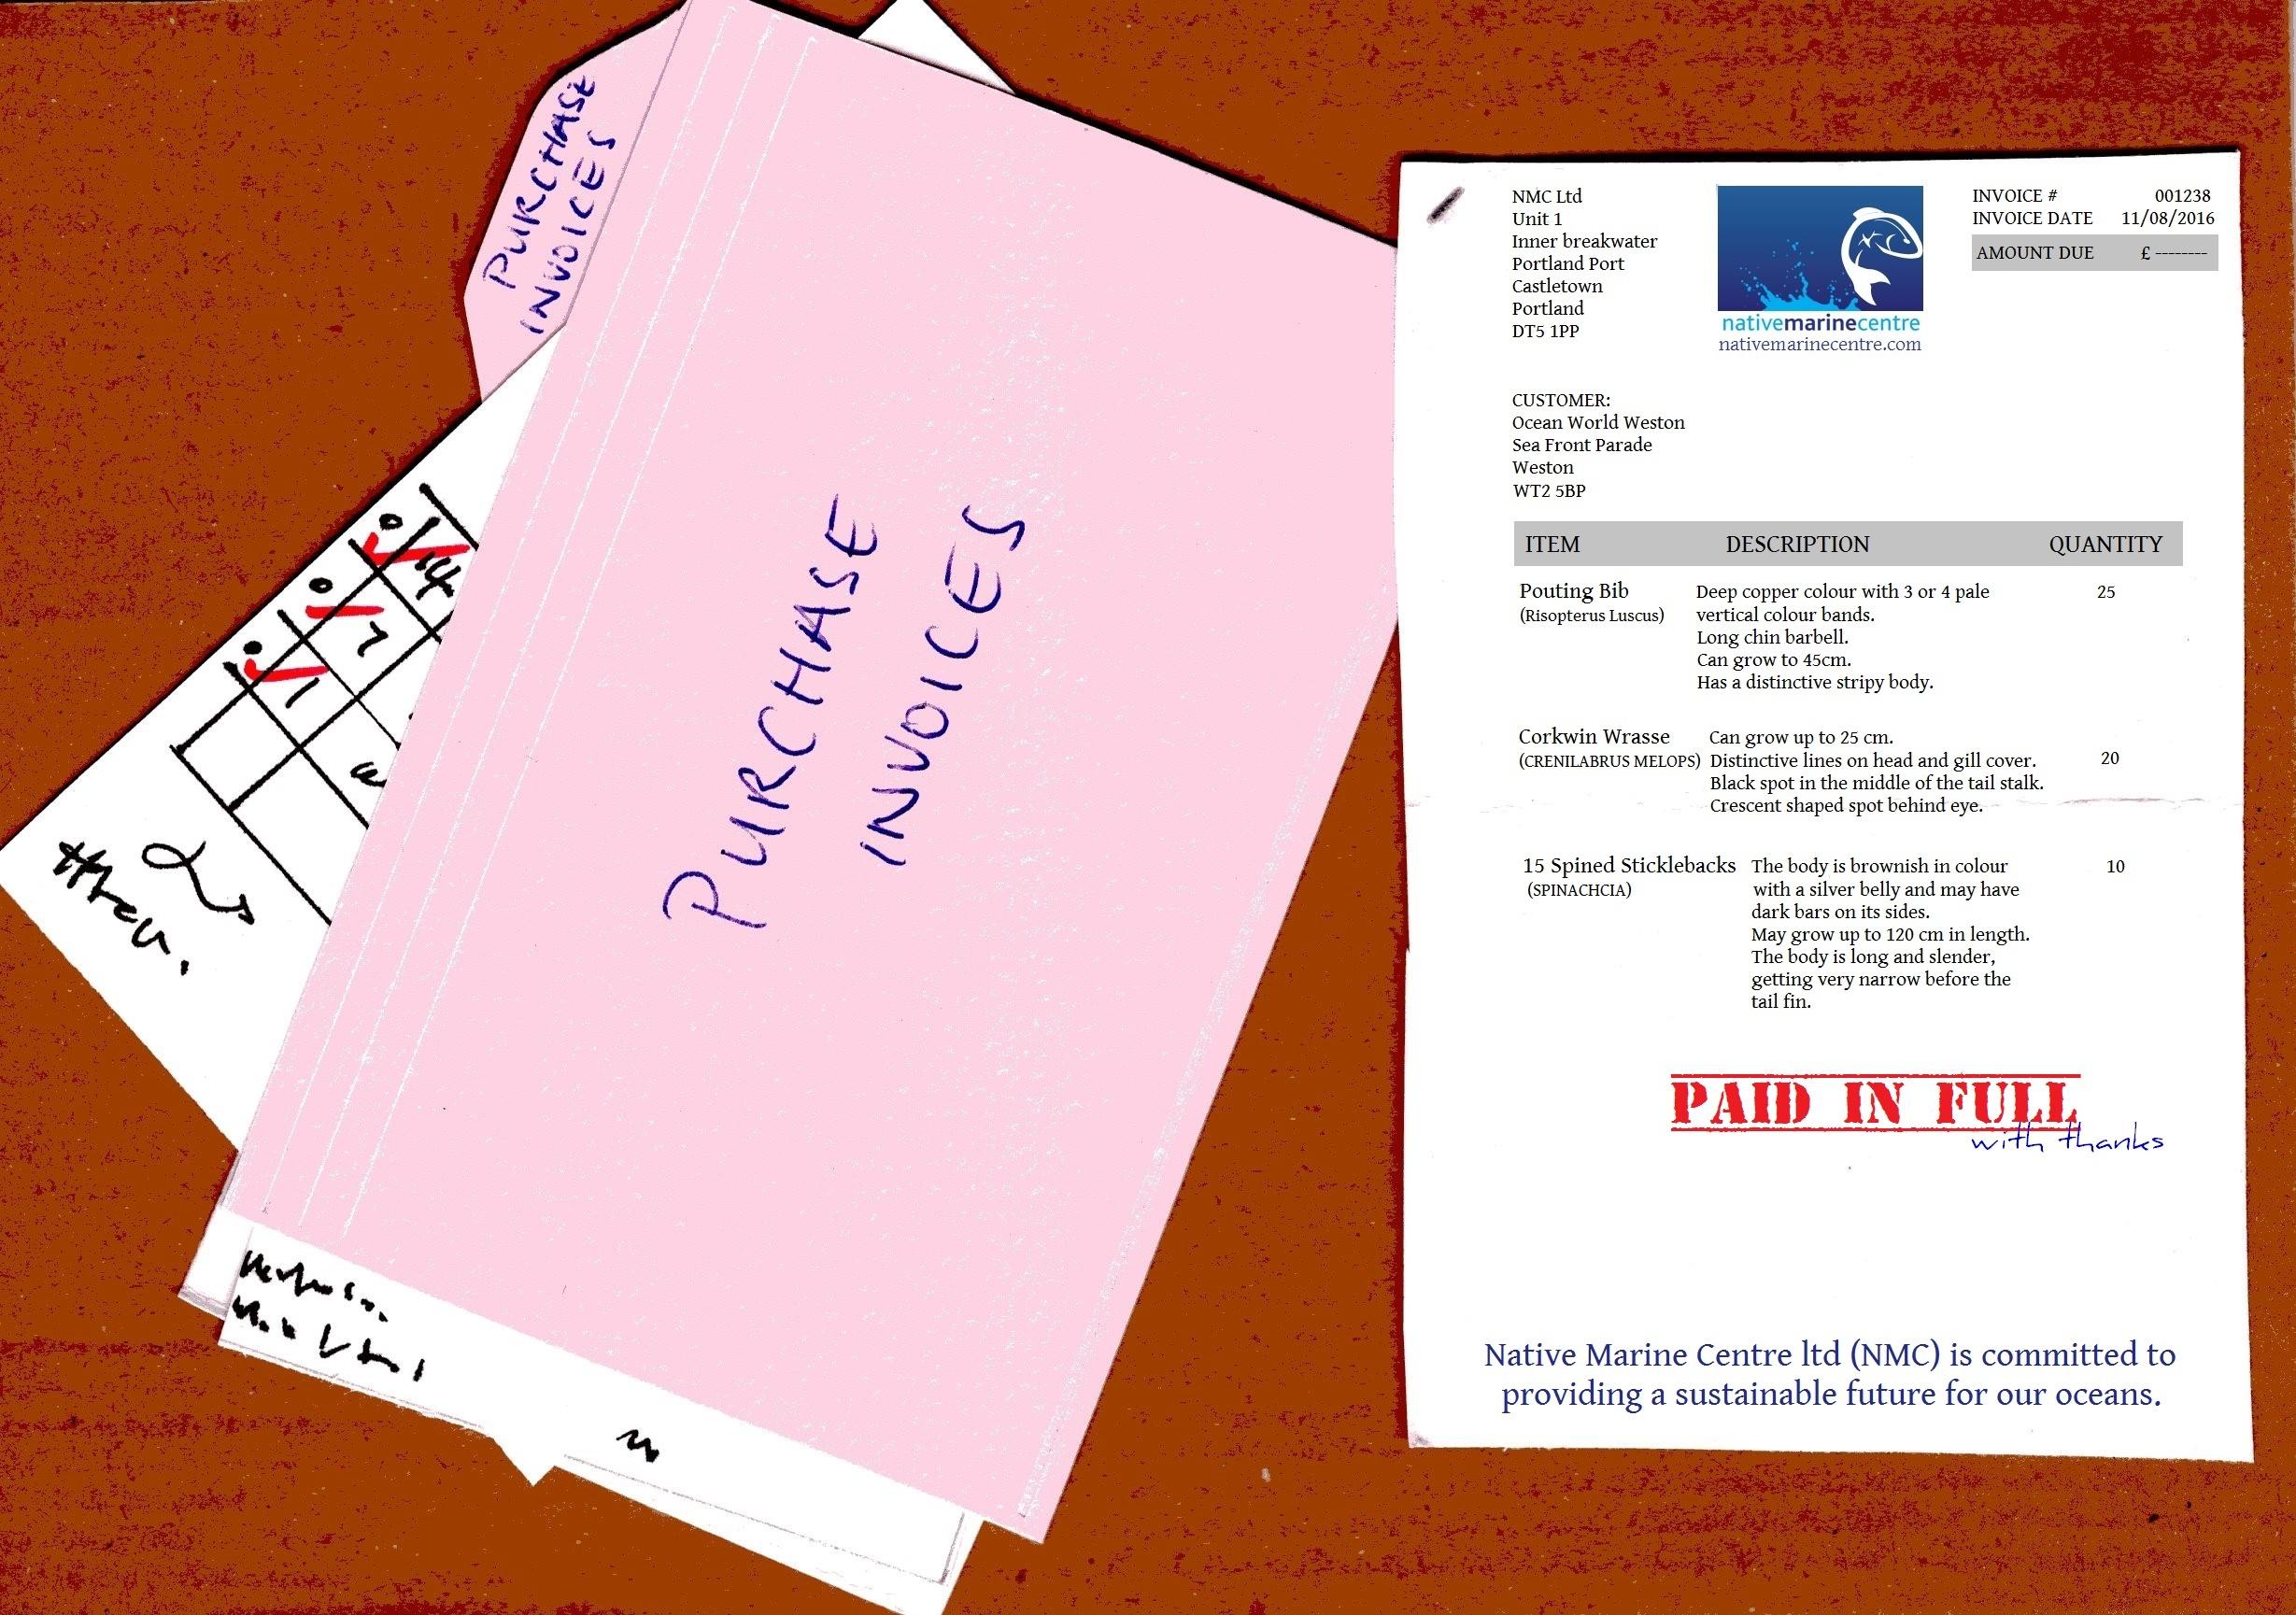 fish purchase invoice